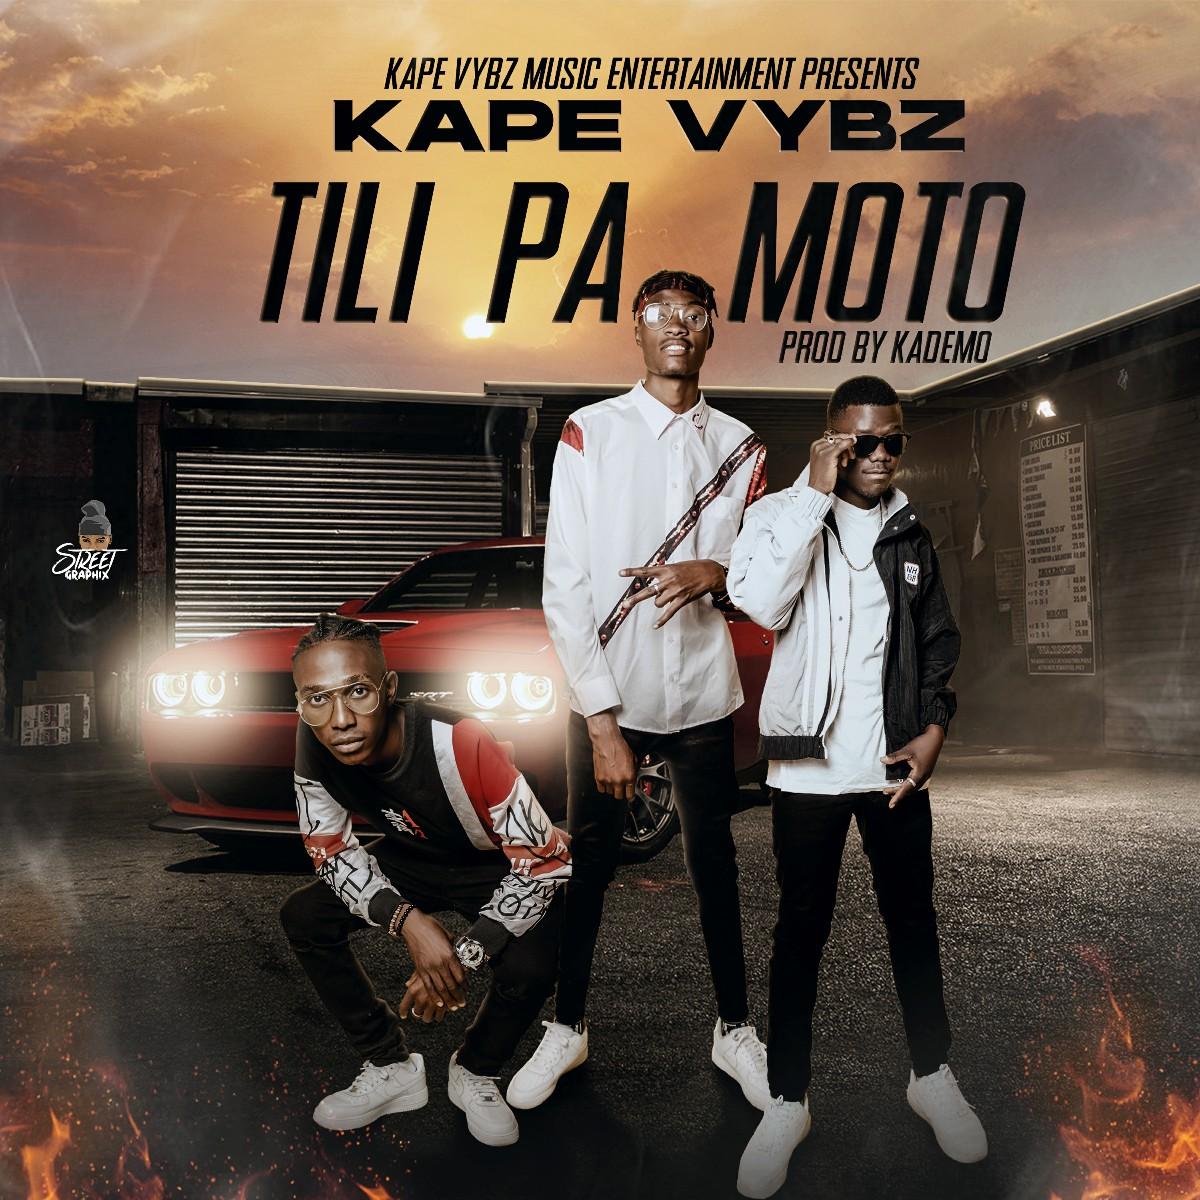 Kape Vybz - Tili Pa Moto (Prod. Kademo)